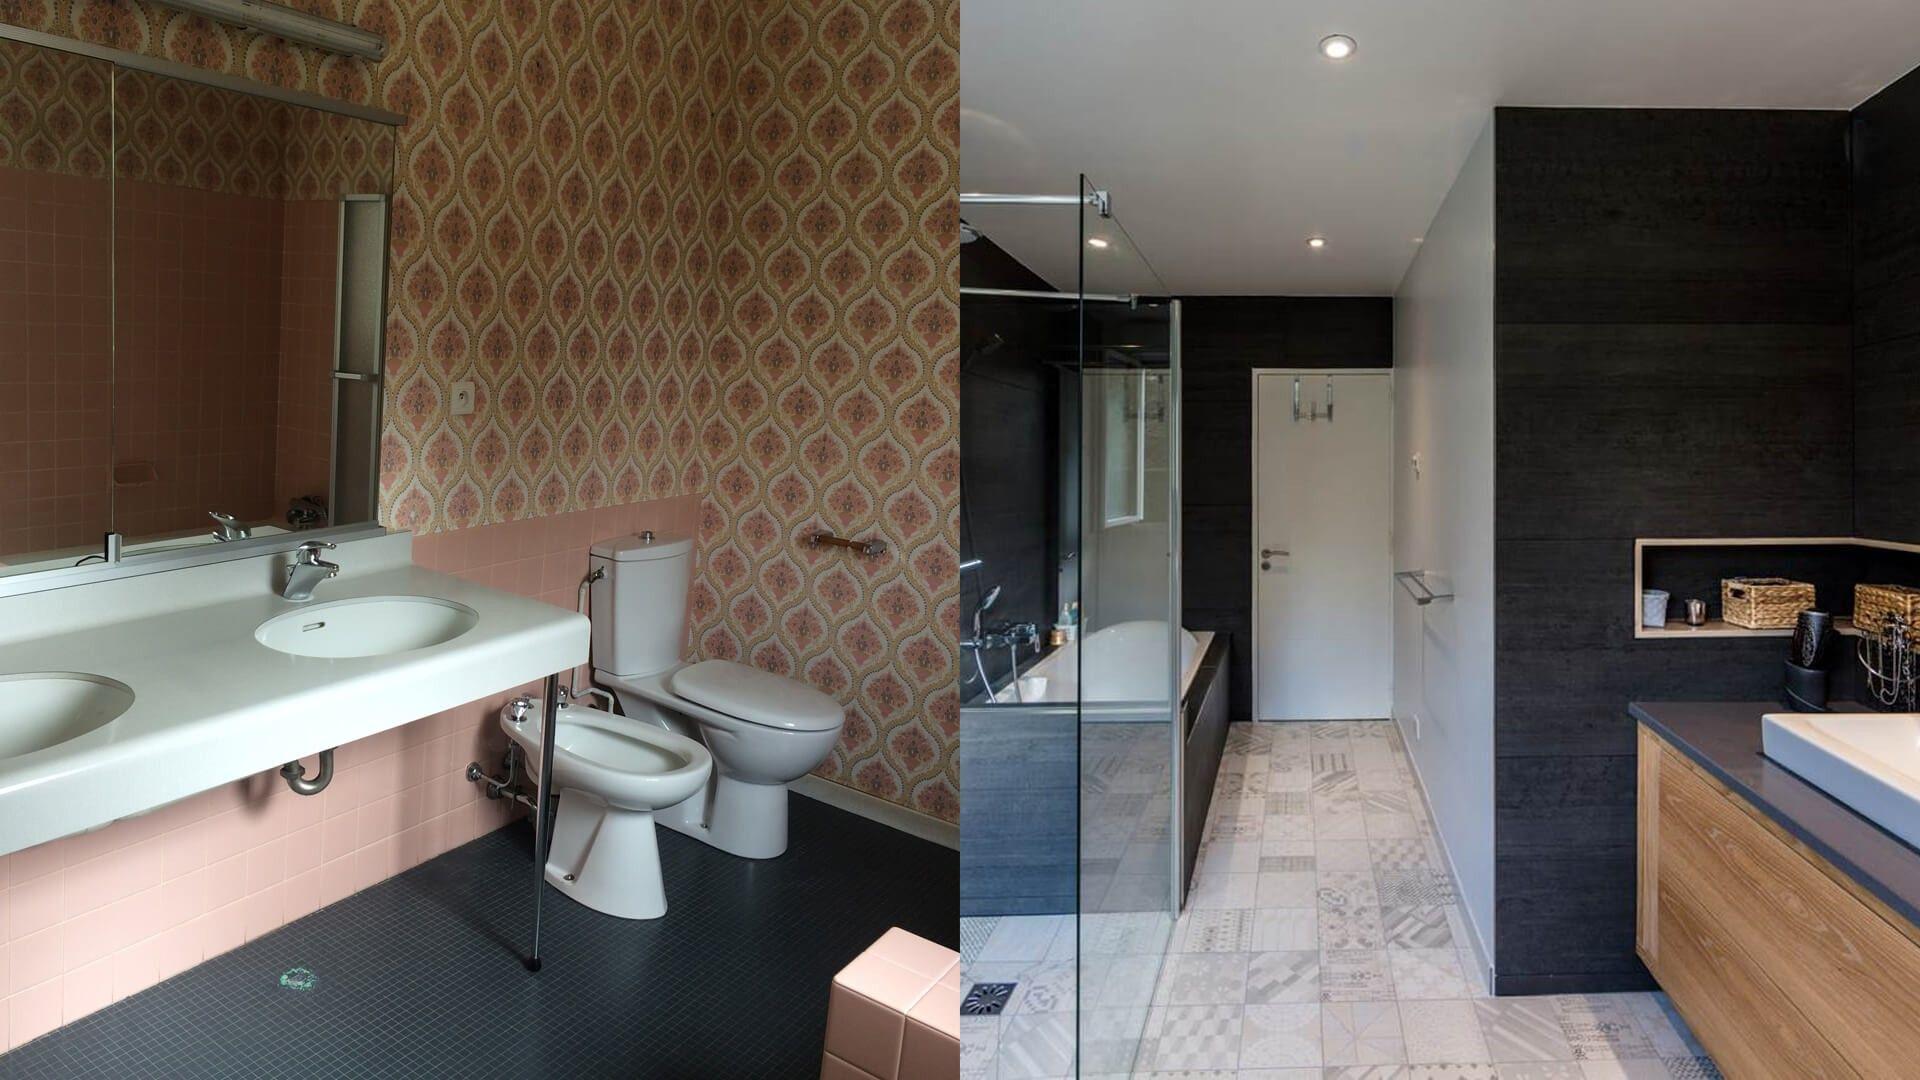 salle de bain moderne et chaleureuse. Black Bedroom Furniture Sets. Home Design Ideas